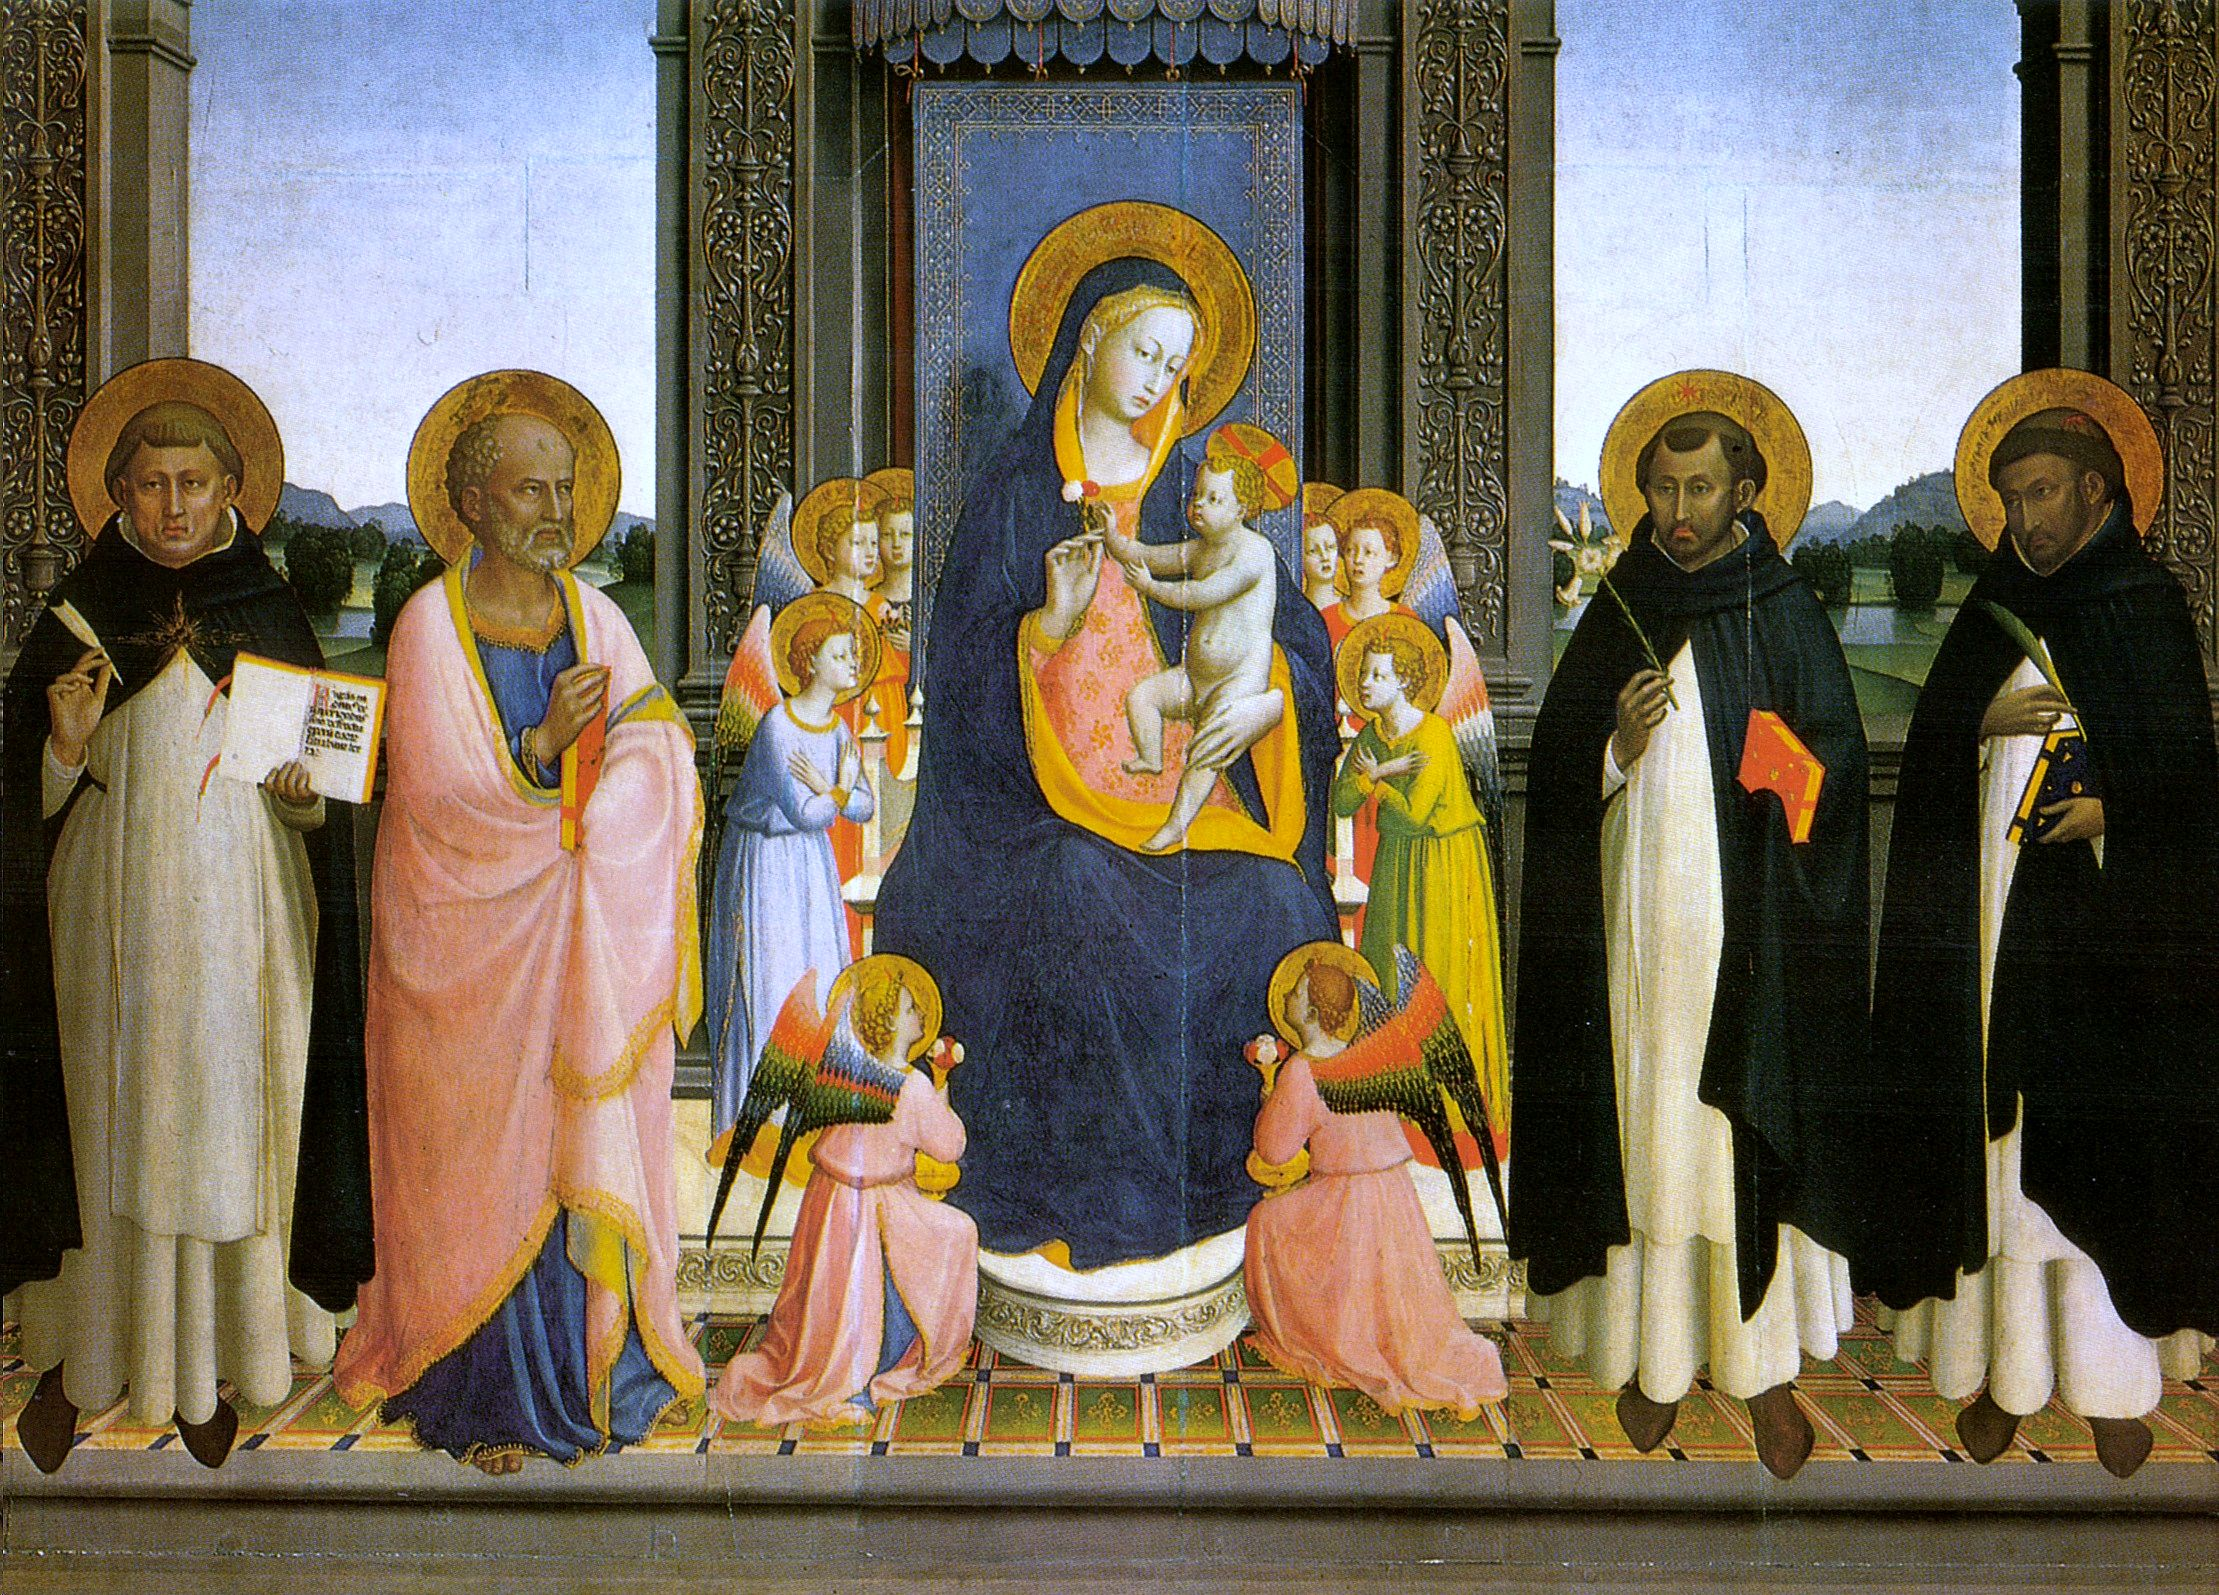 File:Beato angelico, pala fiesole, 1424-1425.jpg